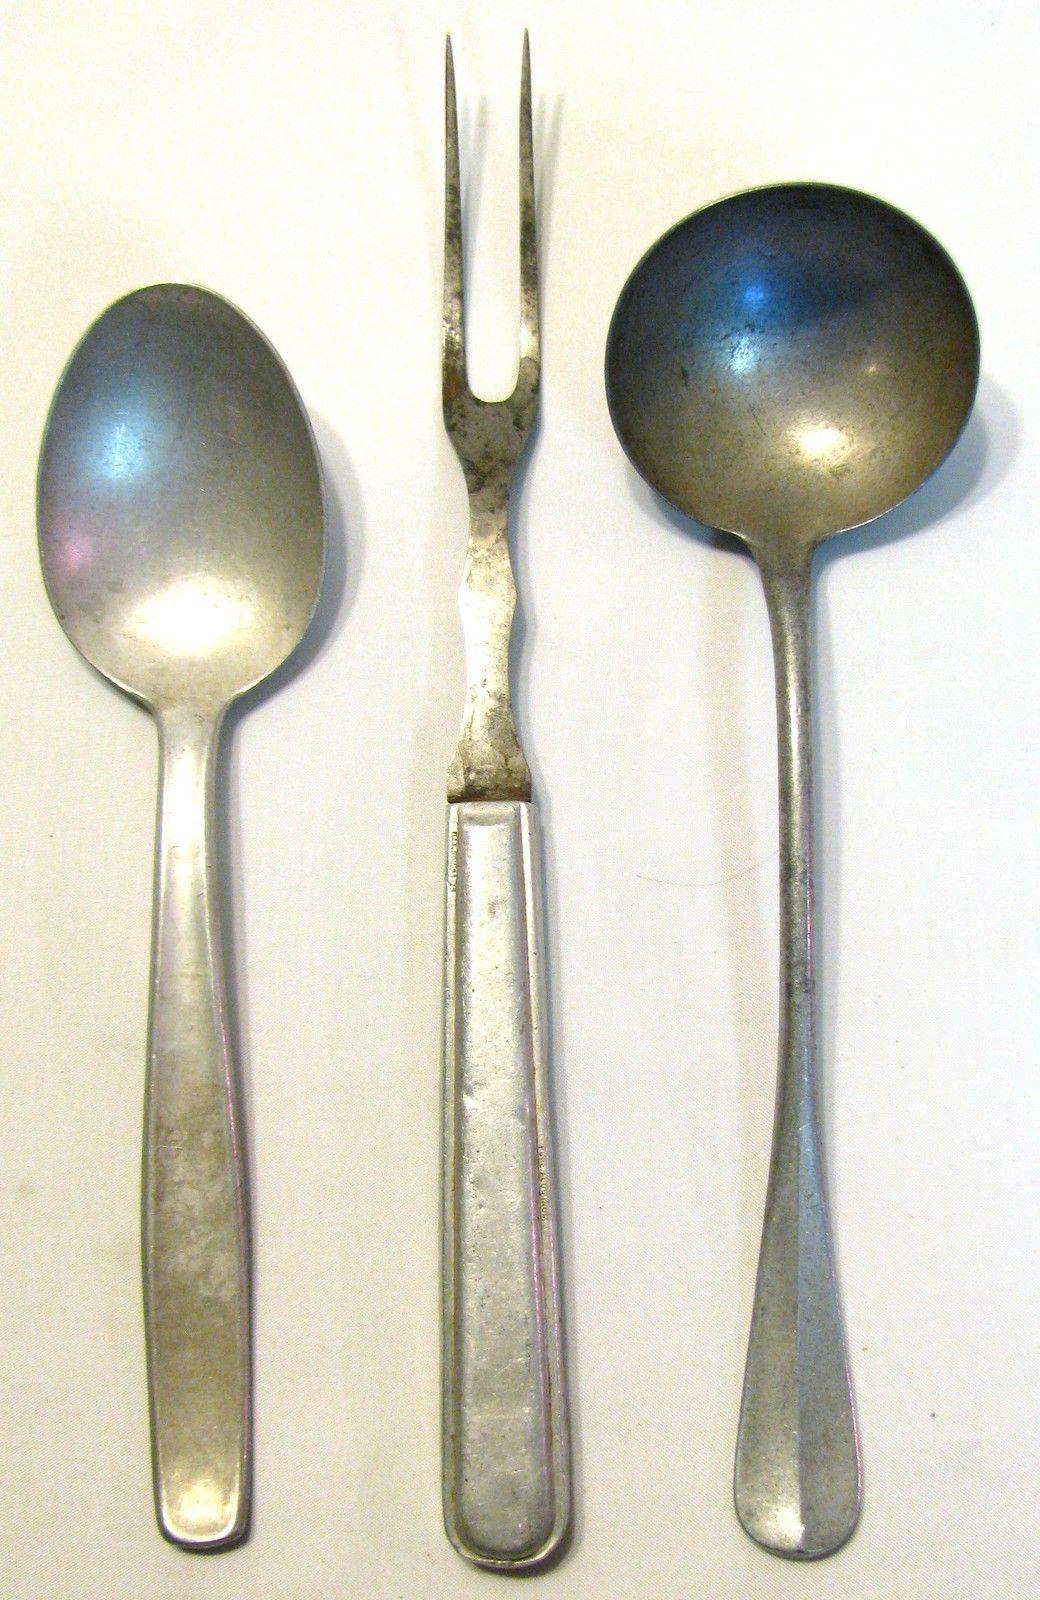 Vintage German WW2 era Aluminum Serving Spoon Fork Ladle Utensils